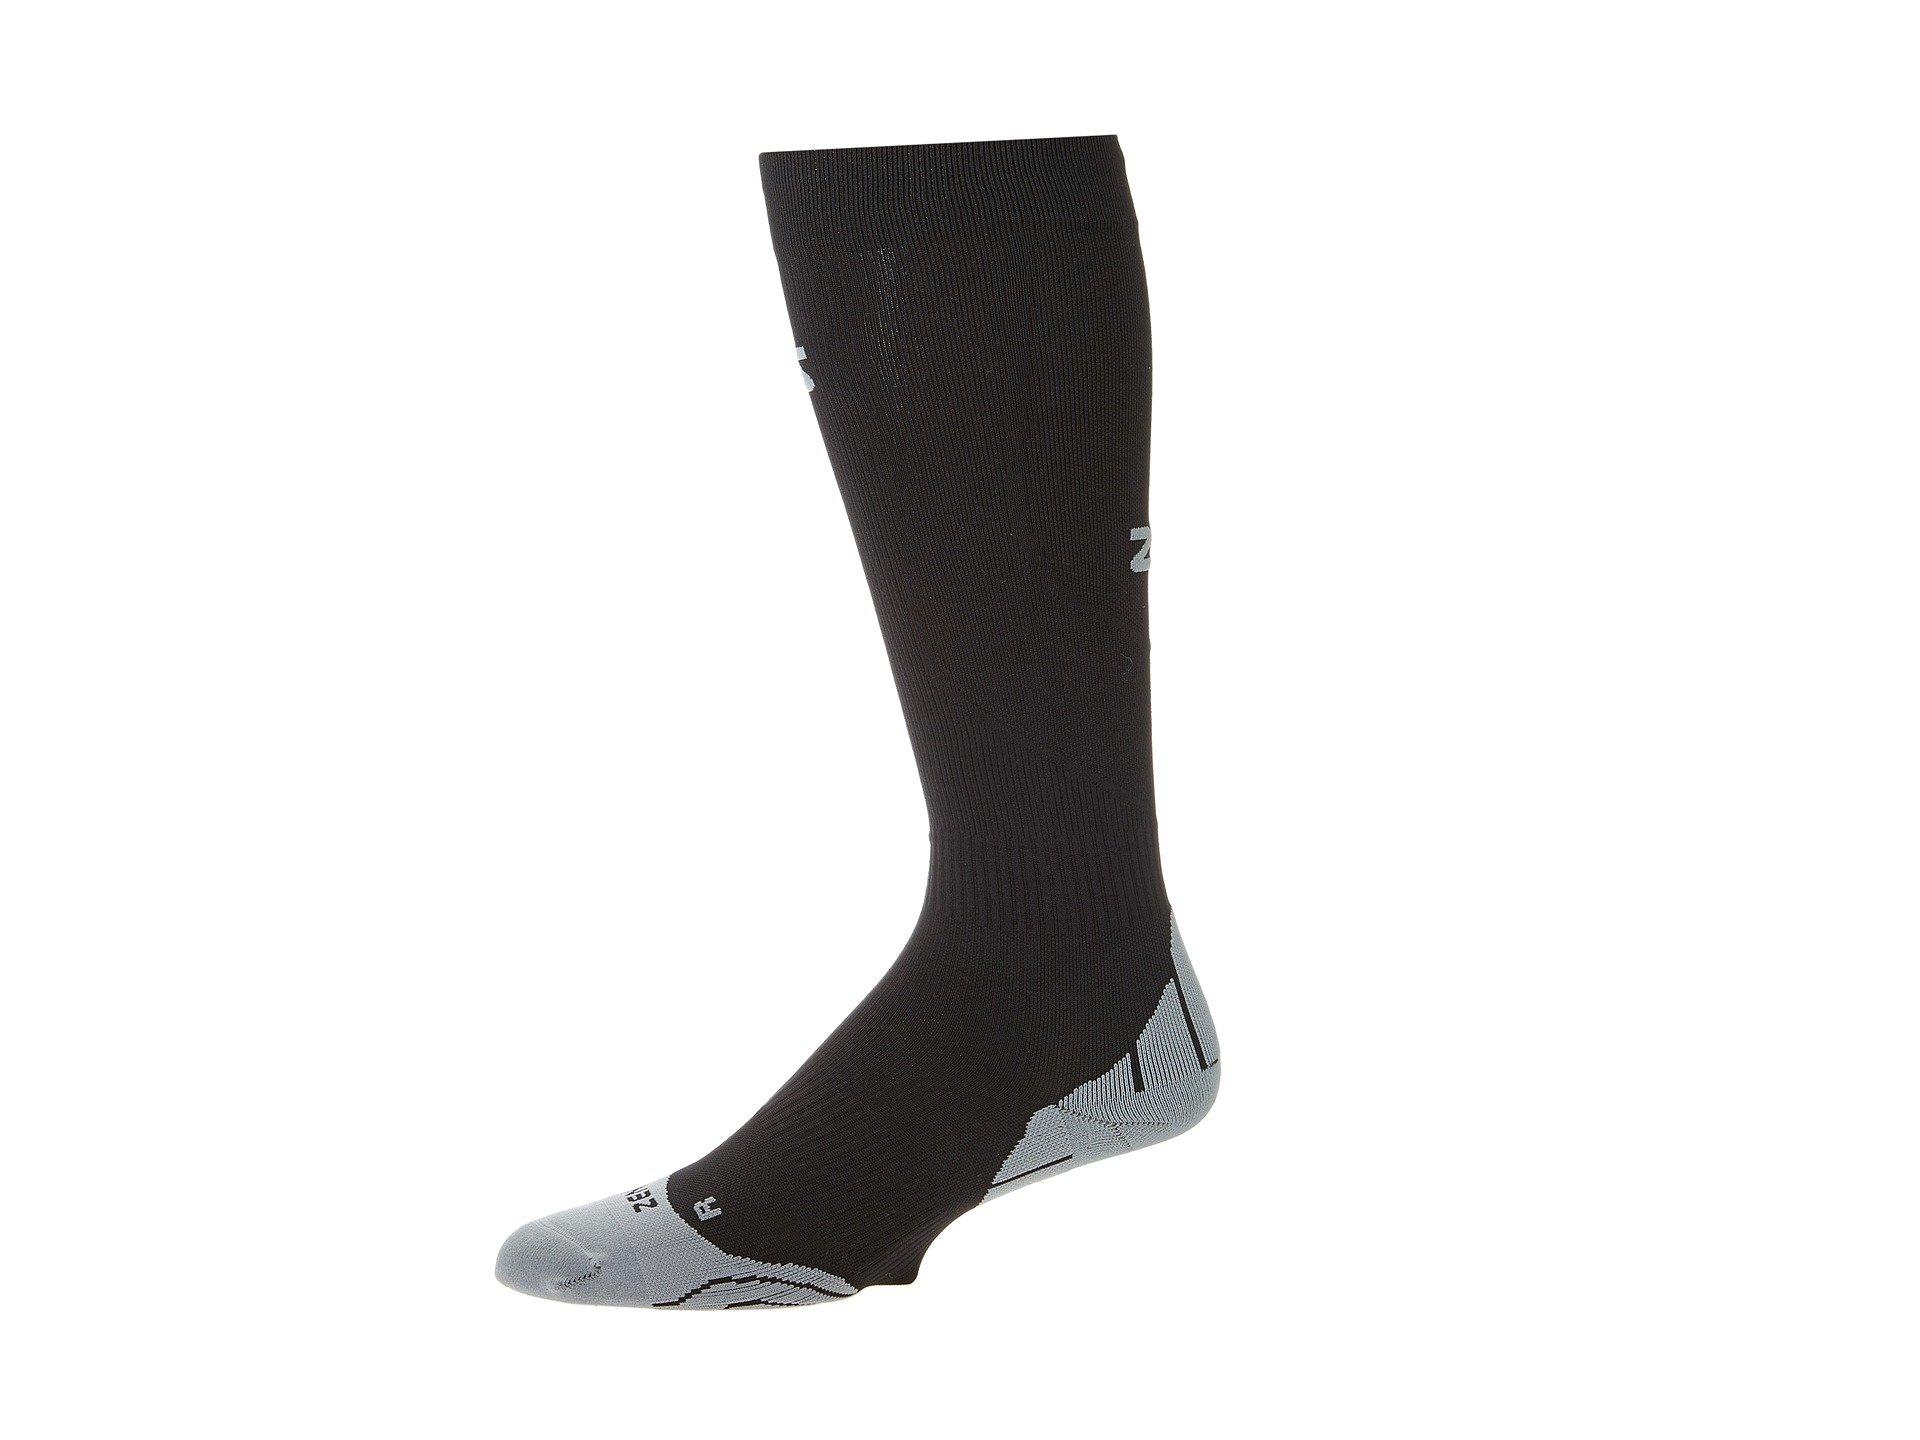 Tech Compression Socks Zensah Zensah Tech Compression Socks Black qXPInw